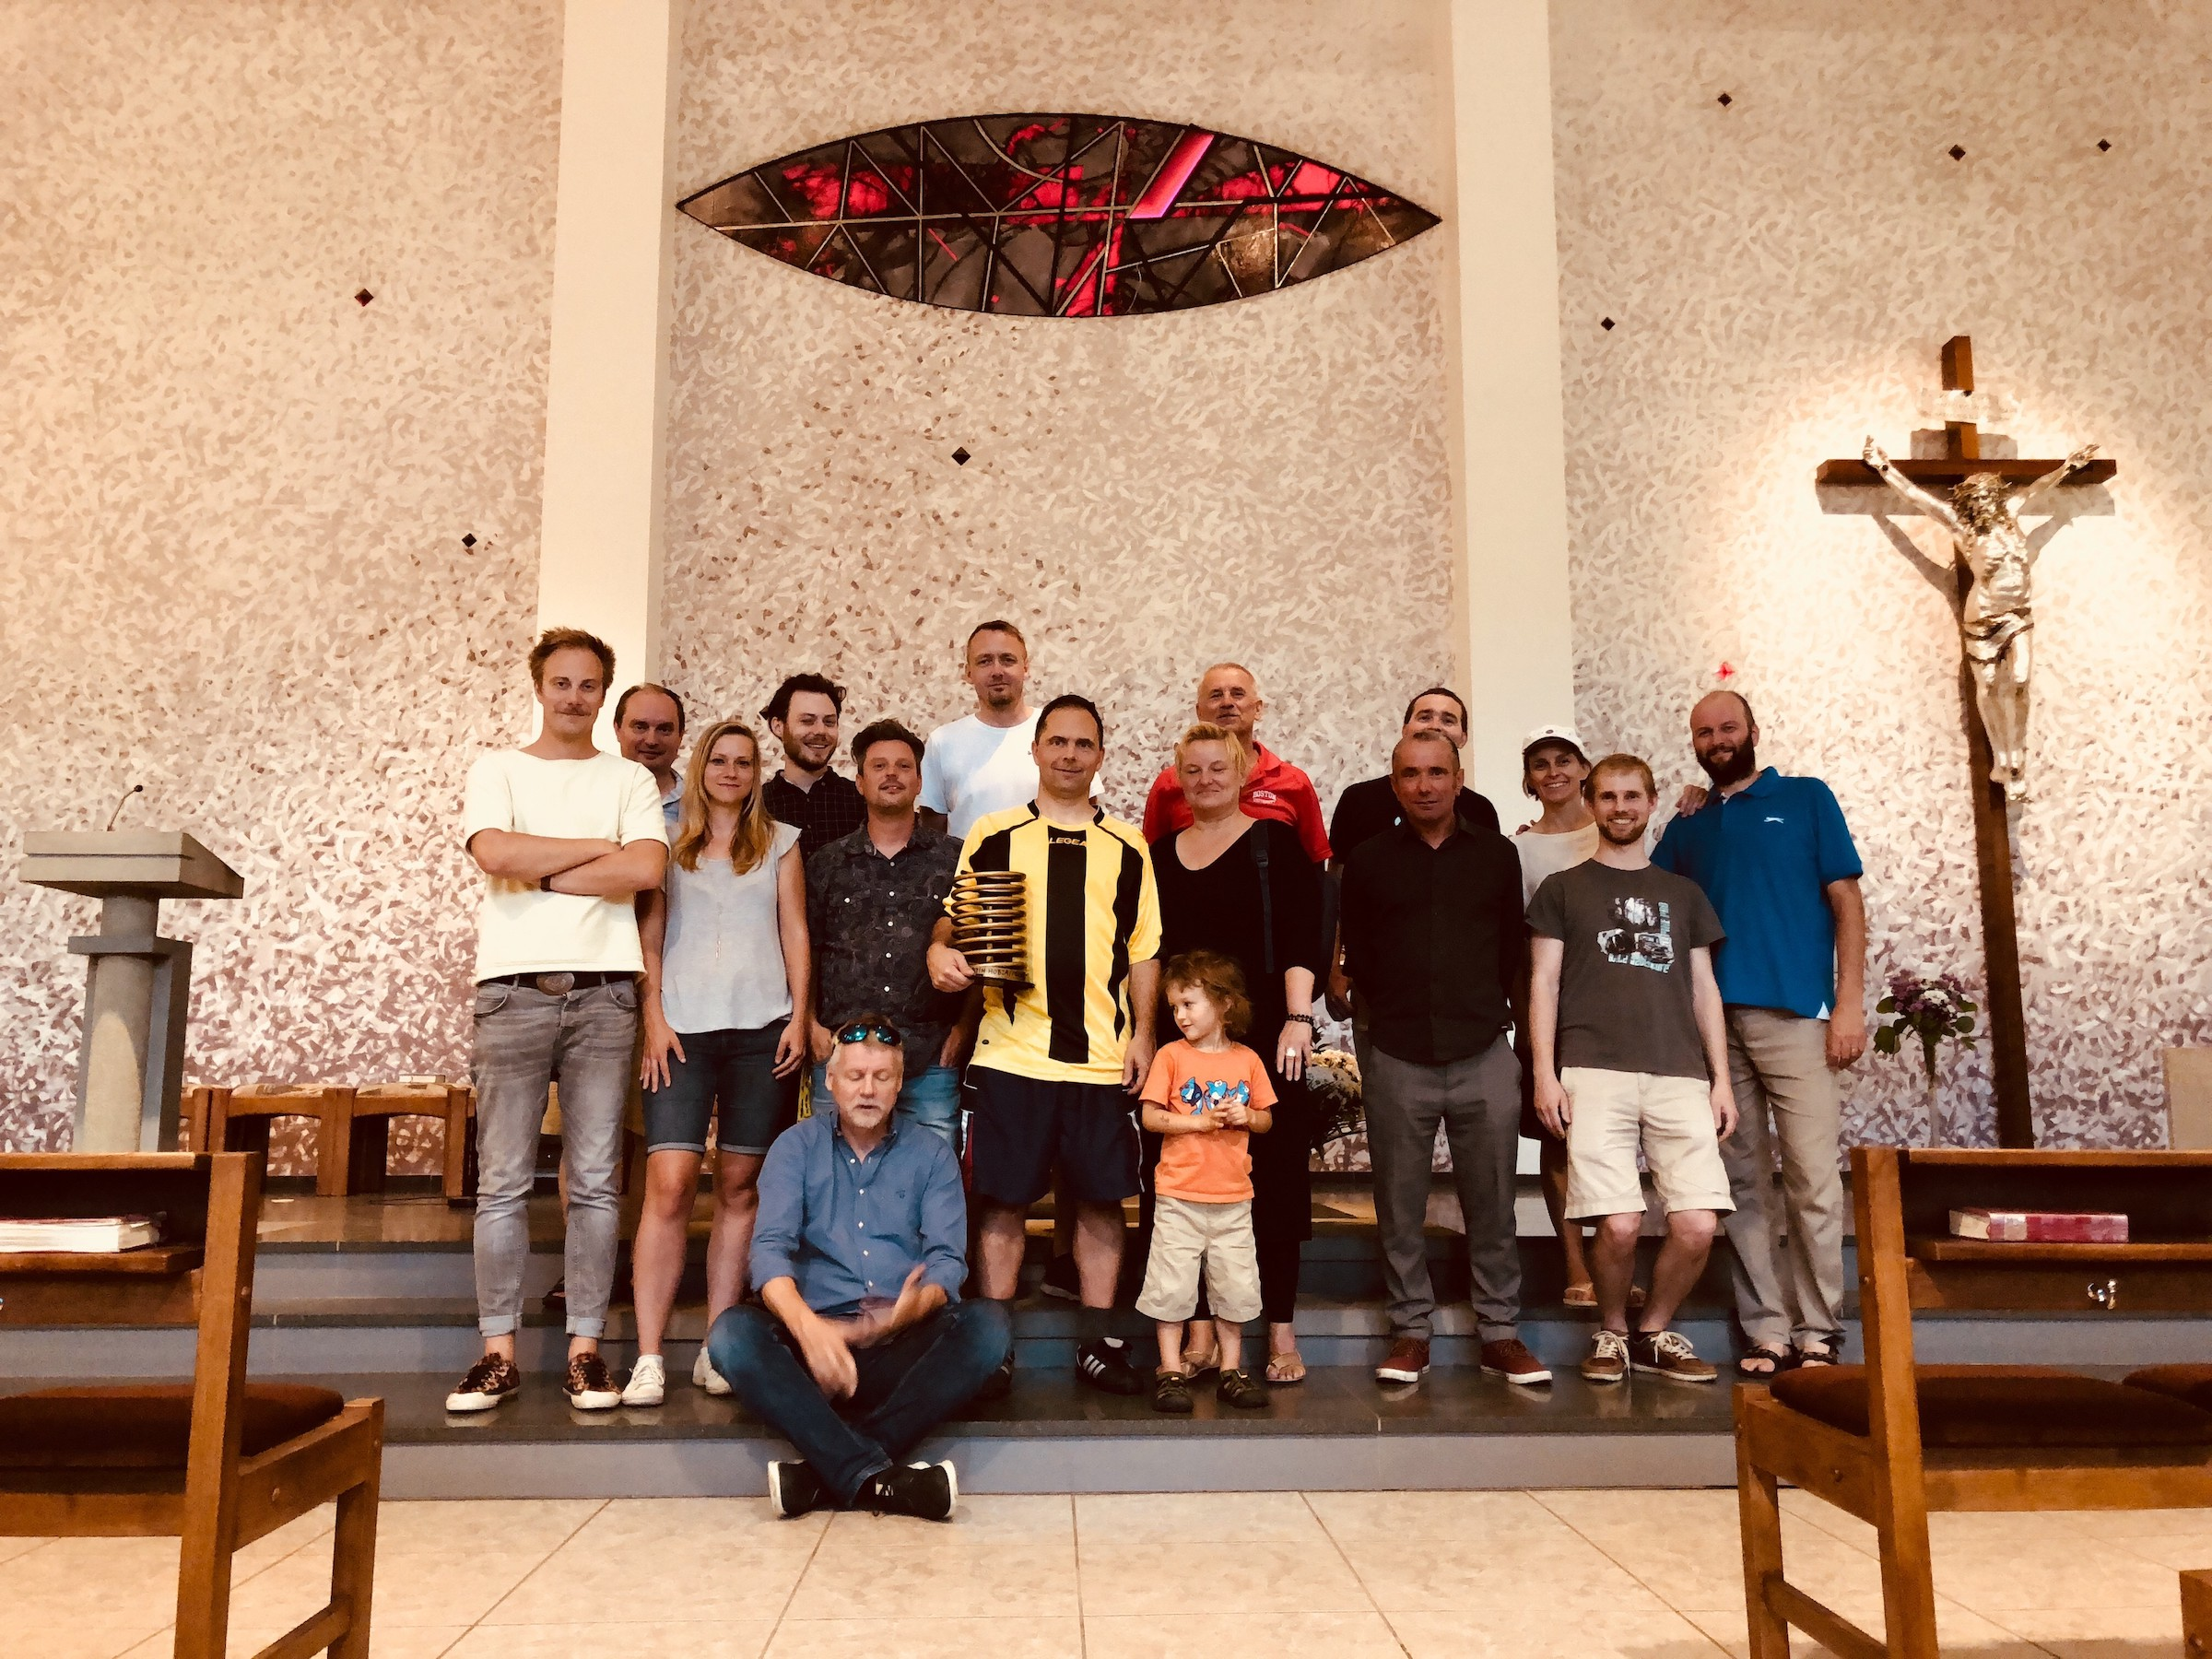 Výherce, farníci a textaři v kostele svaté Terezičky